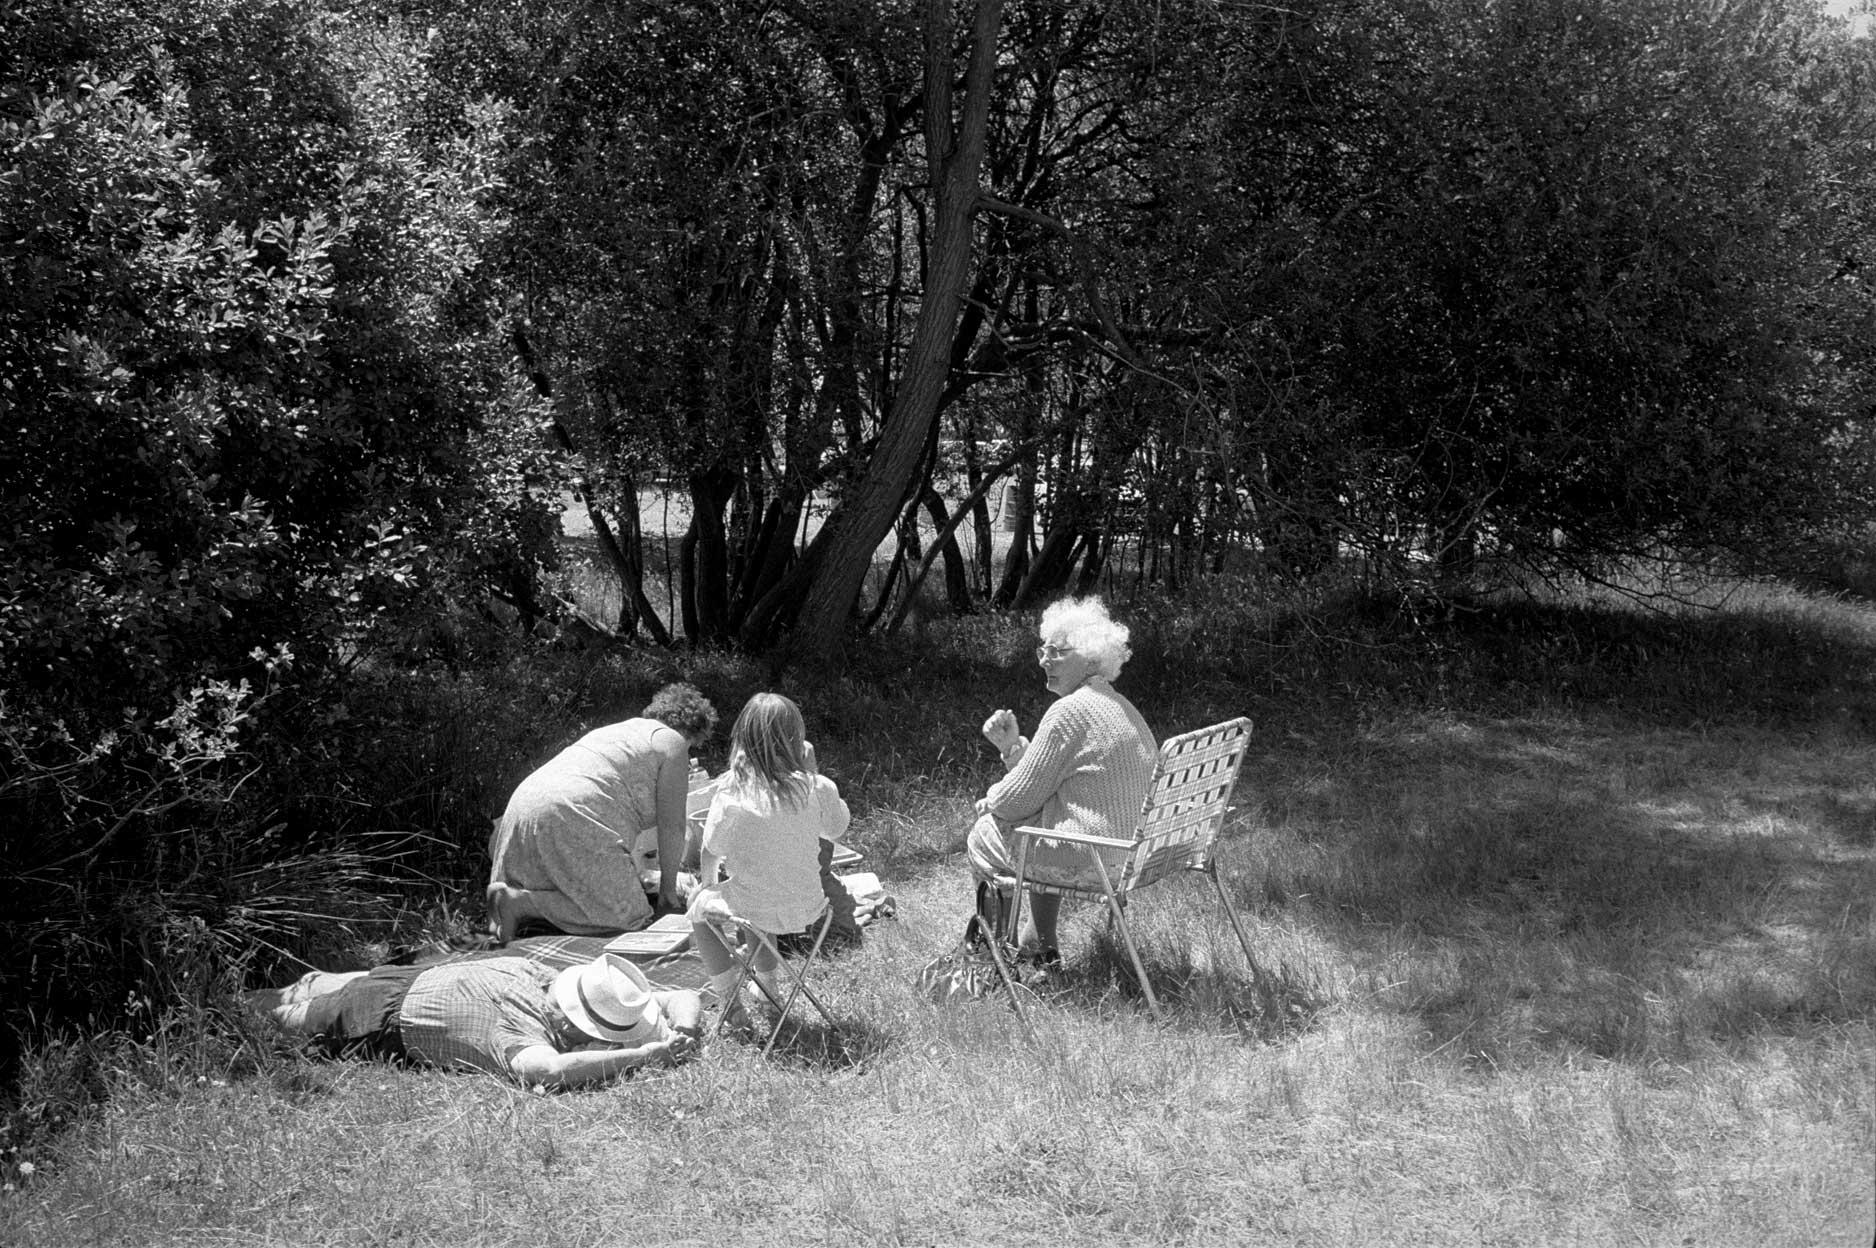 Picnic, The Groynes, Canterbury, 1987